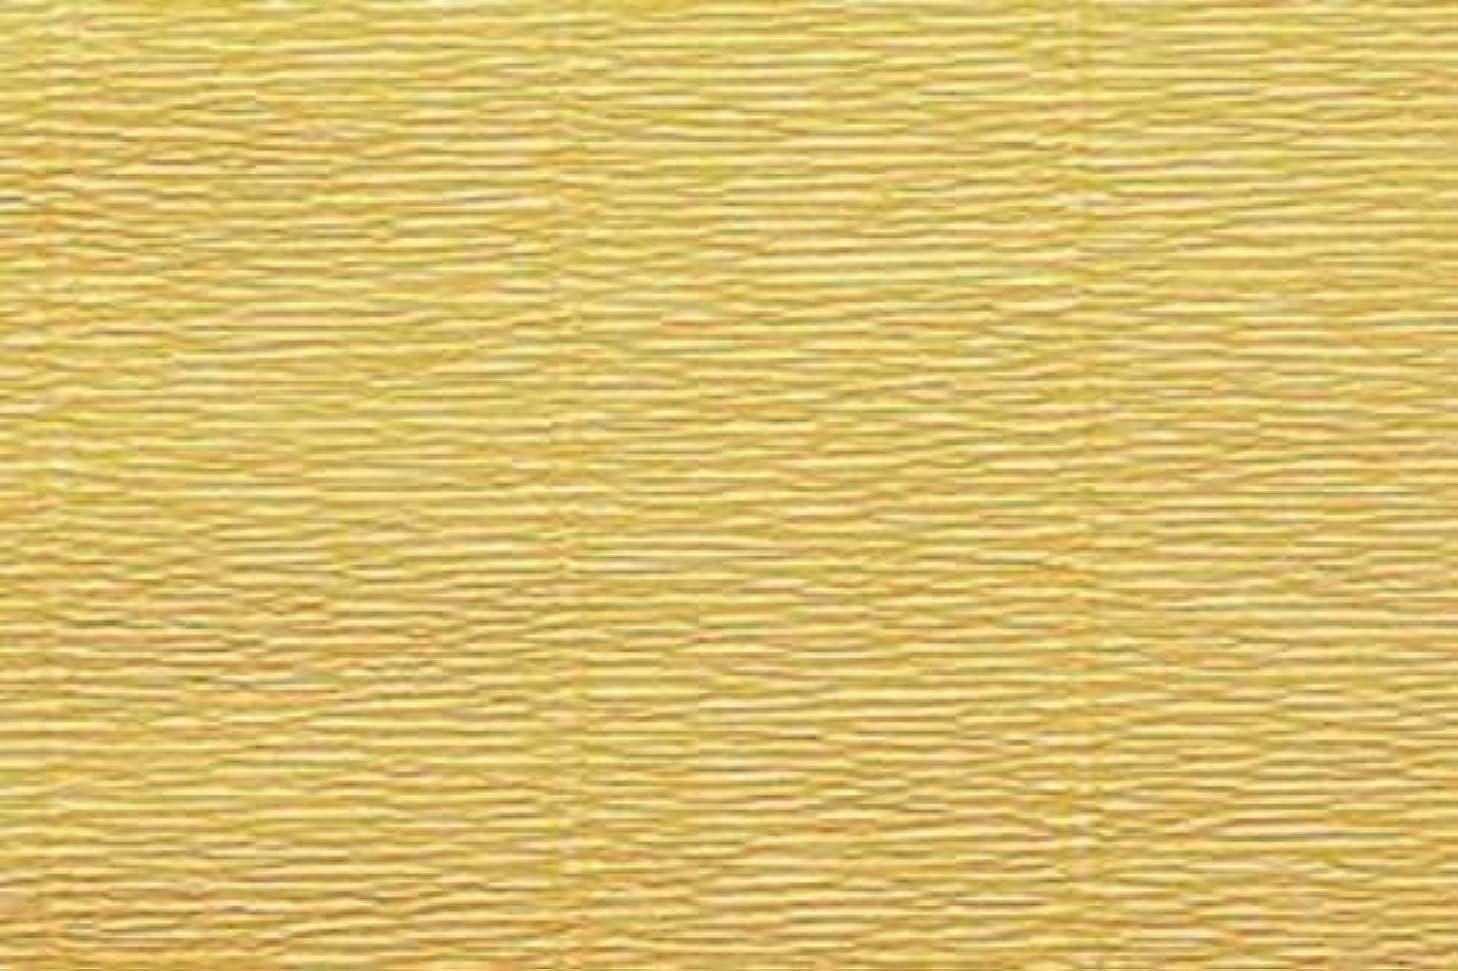 Crepe Paper Roll, Premium Heavy Italian 180 g, 13.3 sqft, Yellow Mustard